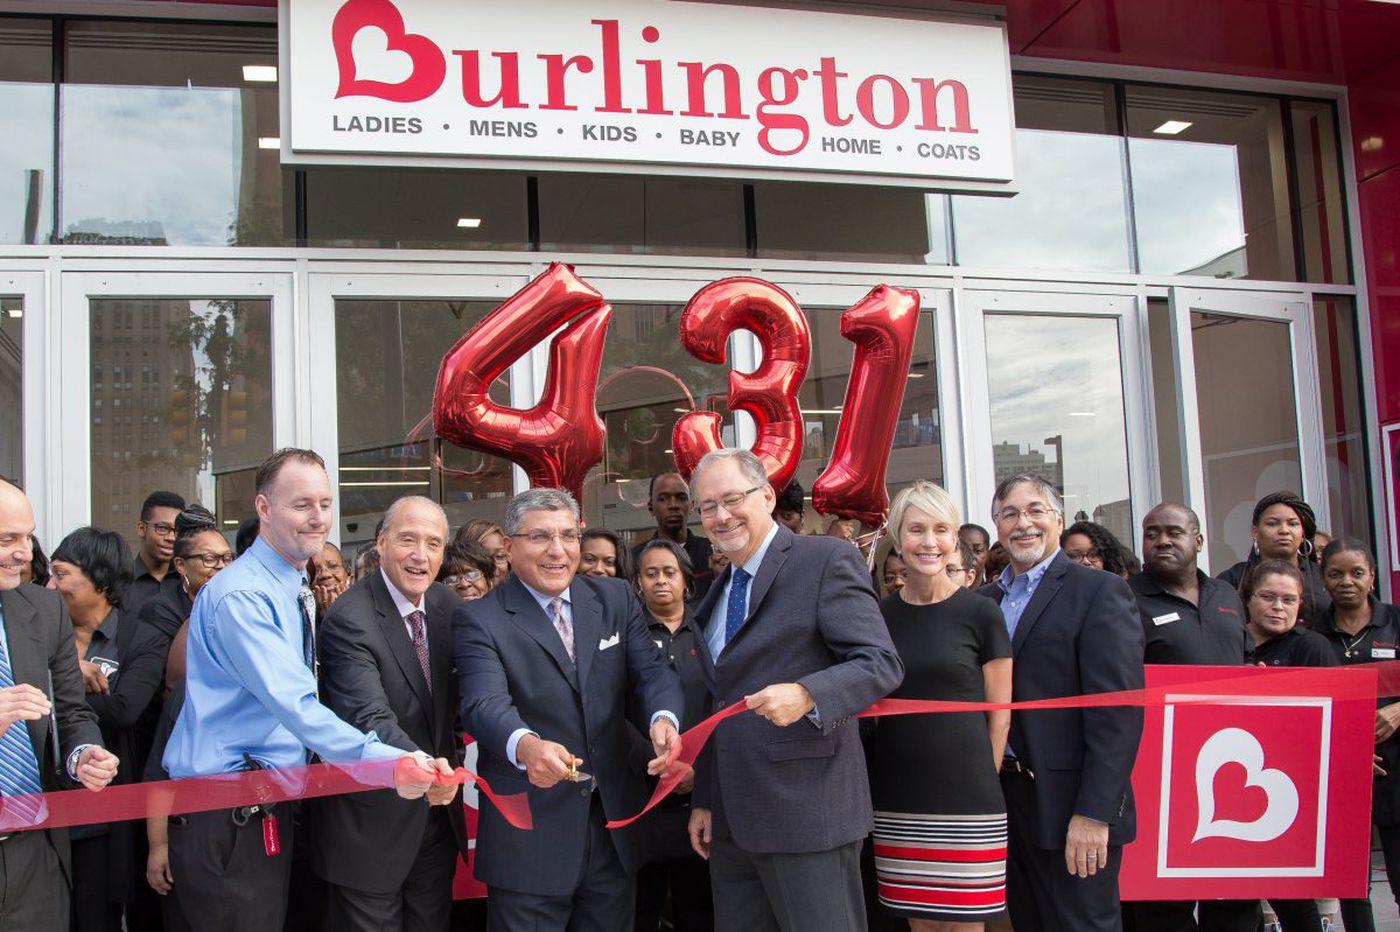 Burlington greets shoppers at new Market Street location